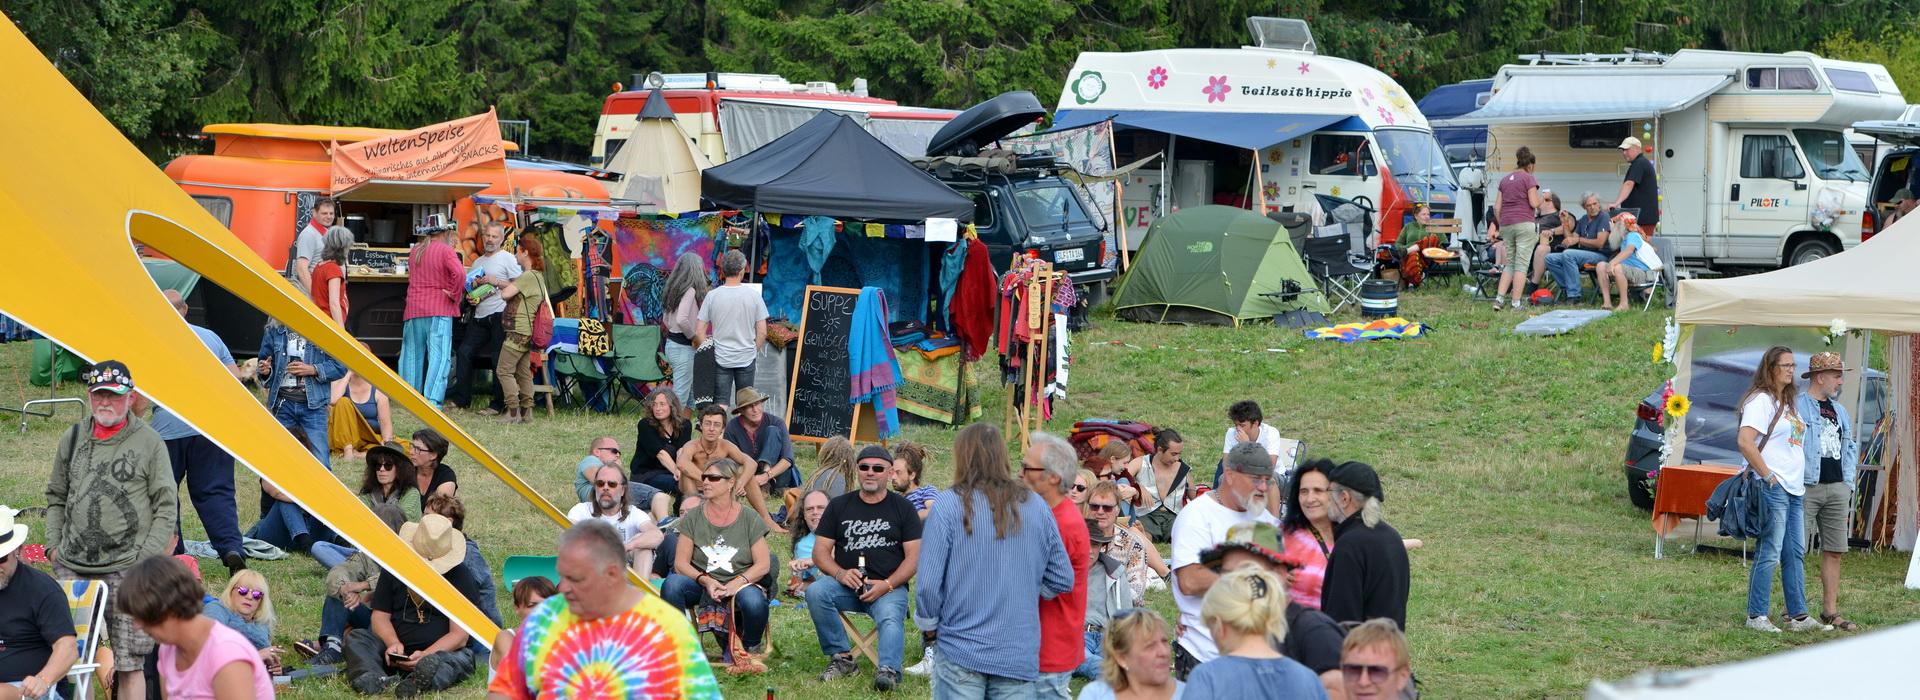 Camp-banner